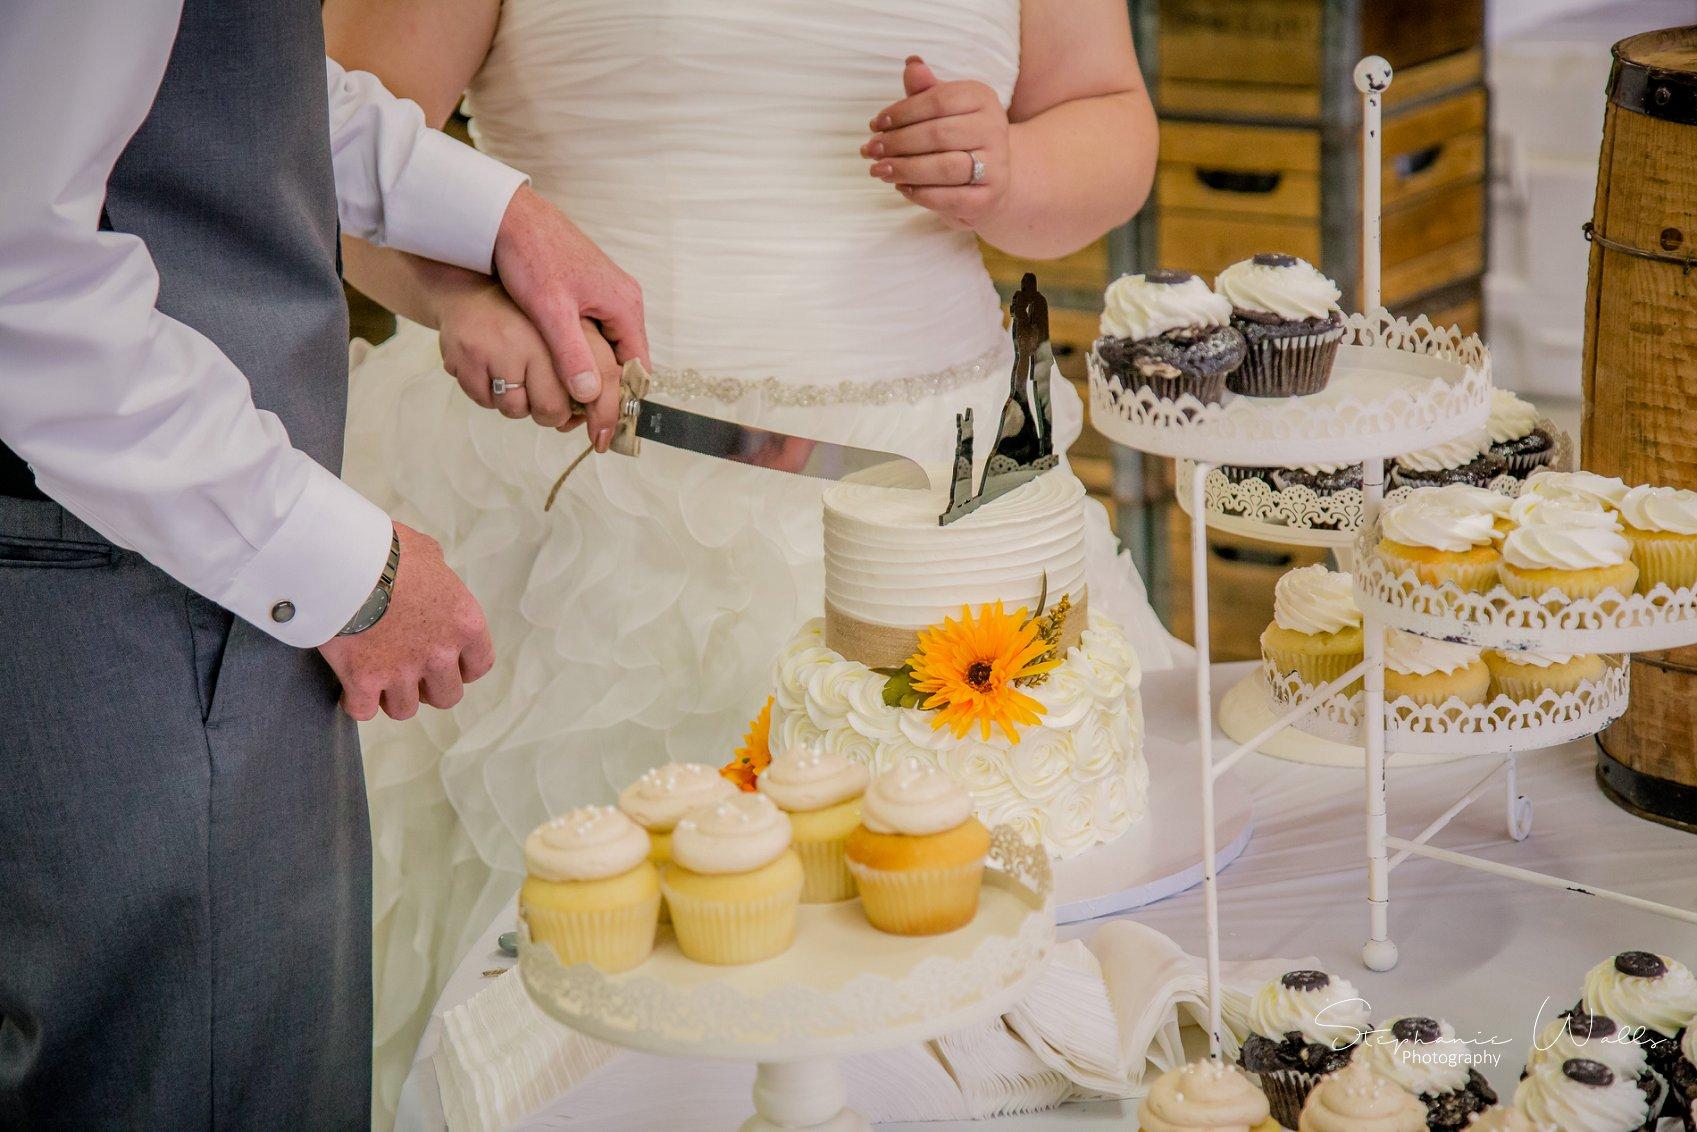 Kimble Wedding 055 Marlena & Allans | Snohomish Red Barn Events (Stocker Farms) | Snohomish, Wa Wedding Photographer